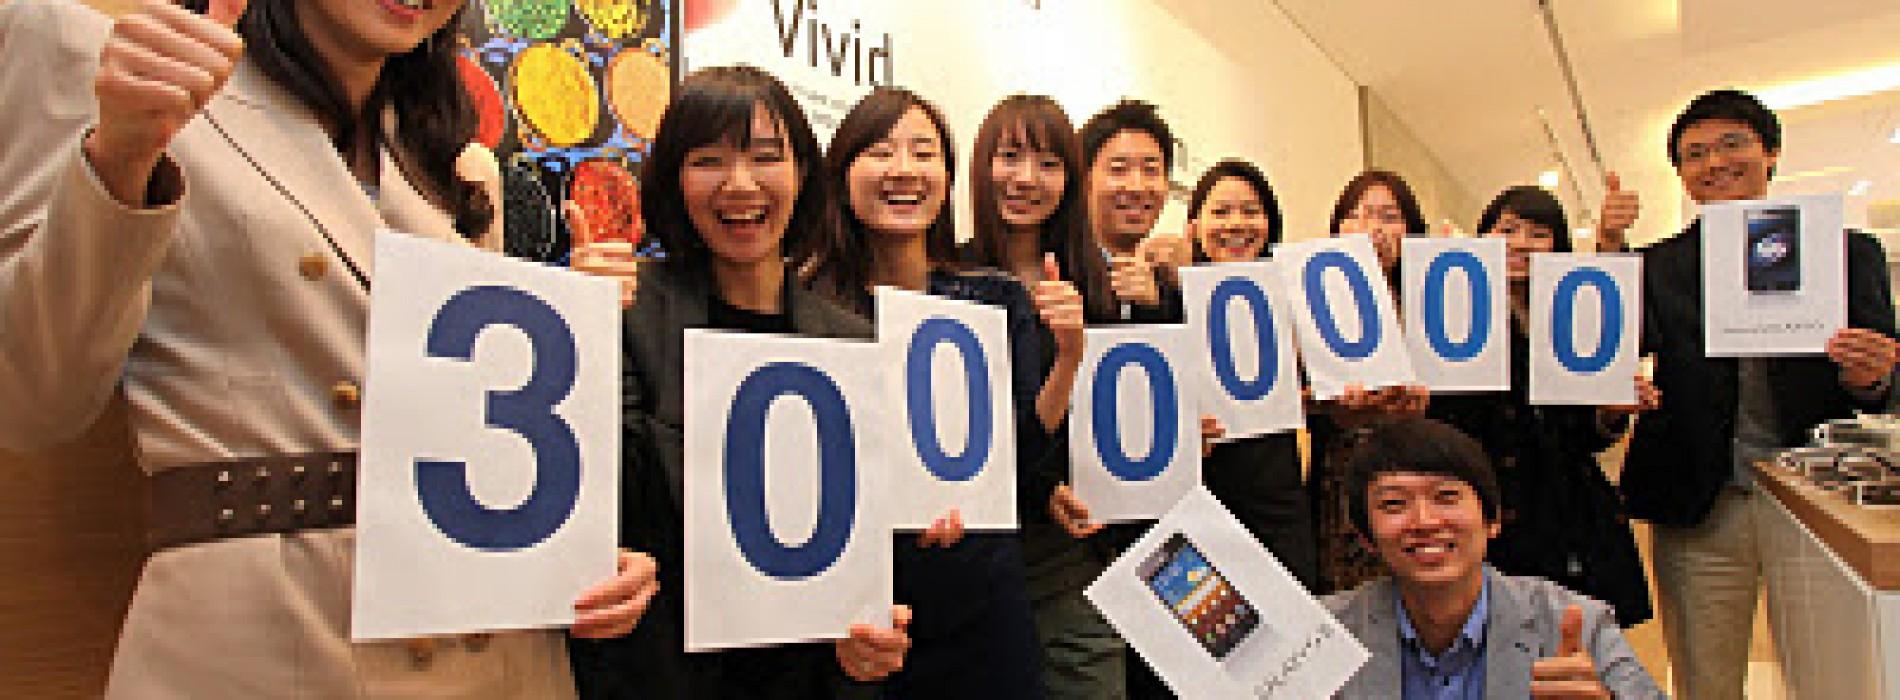 Samsung Celebrates 30 Million Galaxy S, Galaxy S II Sales